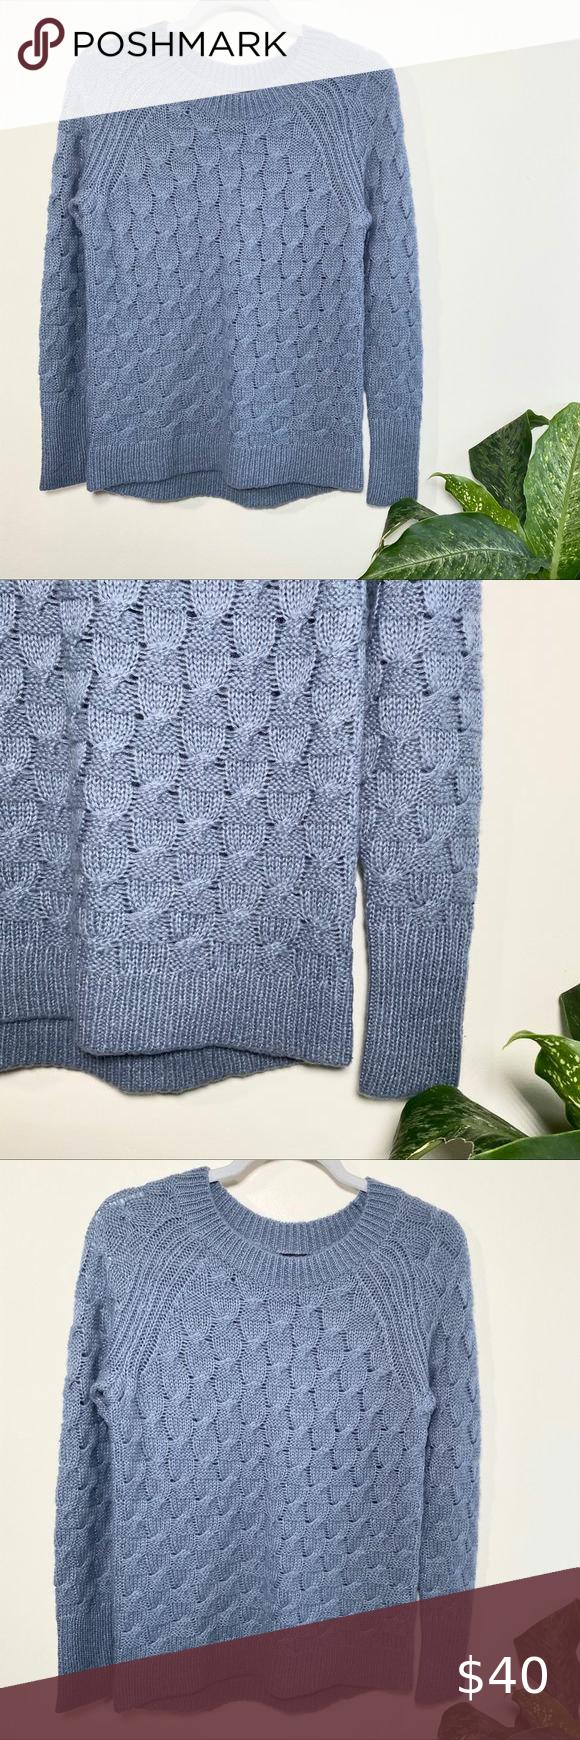 Ann Taylor blue acrylic wool blend sweater small Ann Taylor